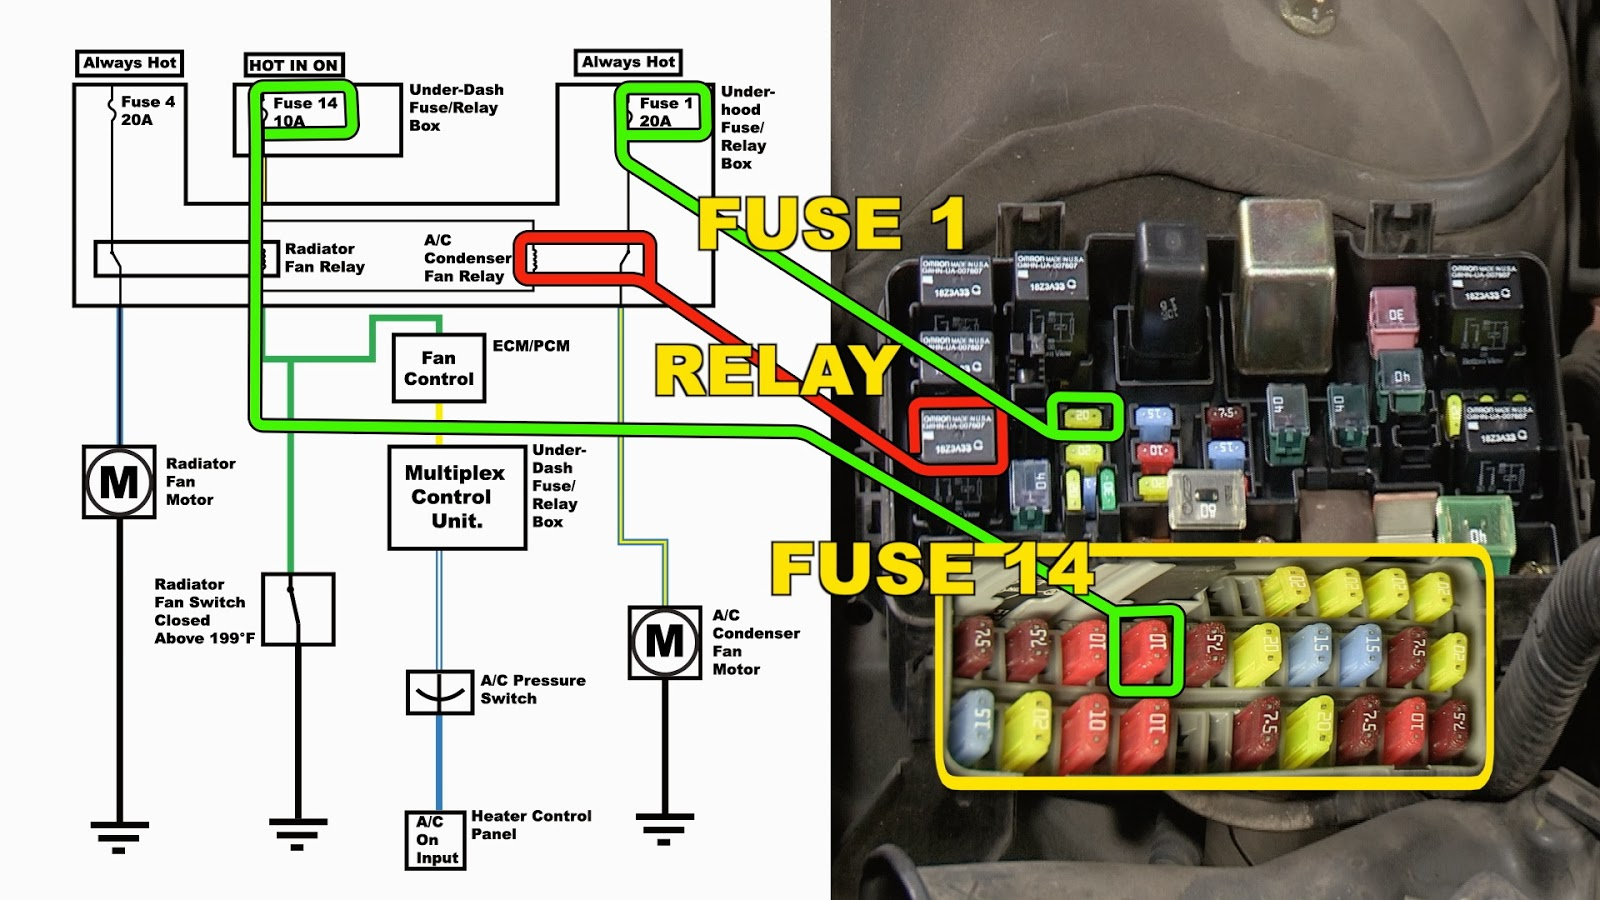 2004 Civic Relay Diagram Schematics Wiring Diagrams Honda 5 Pin Fuse Box Relays Suzuki Aerio Symbols